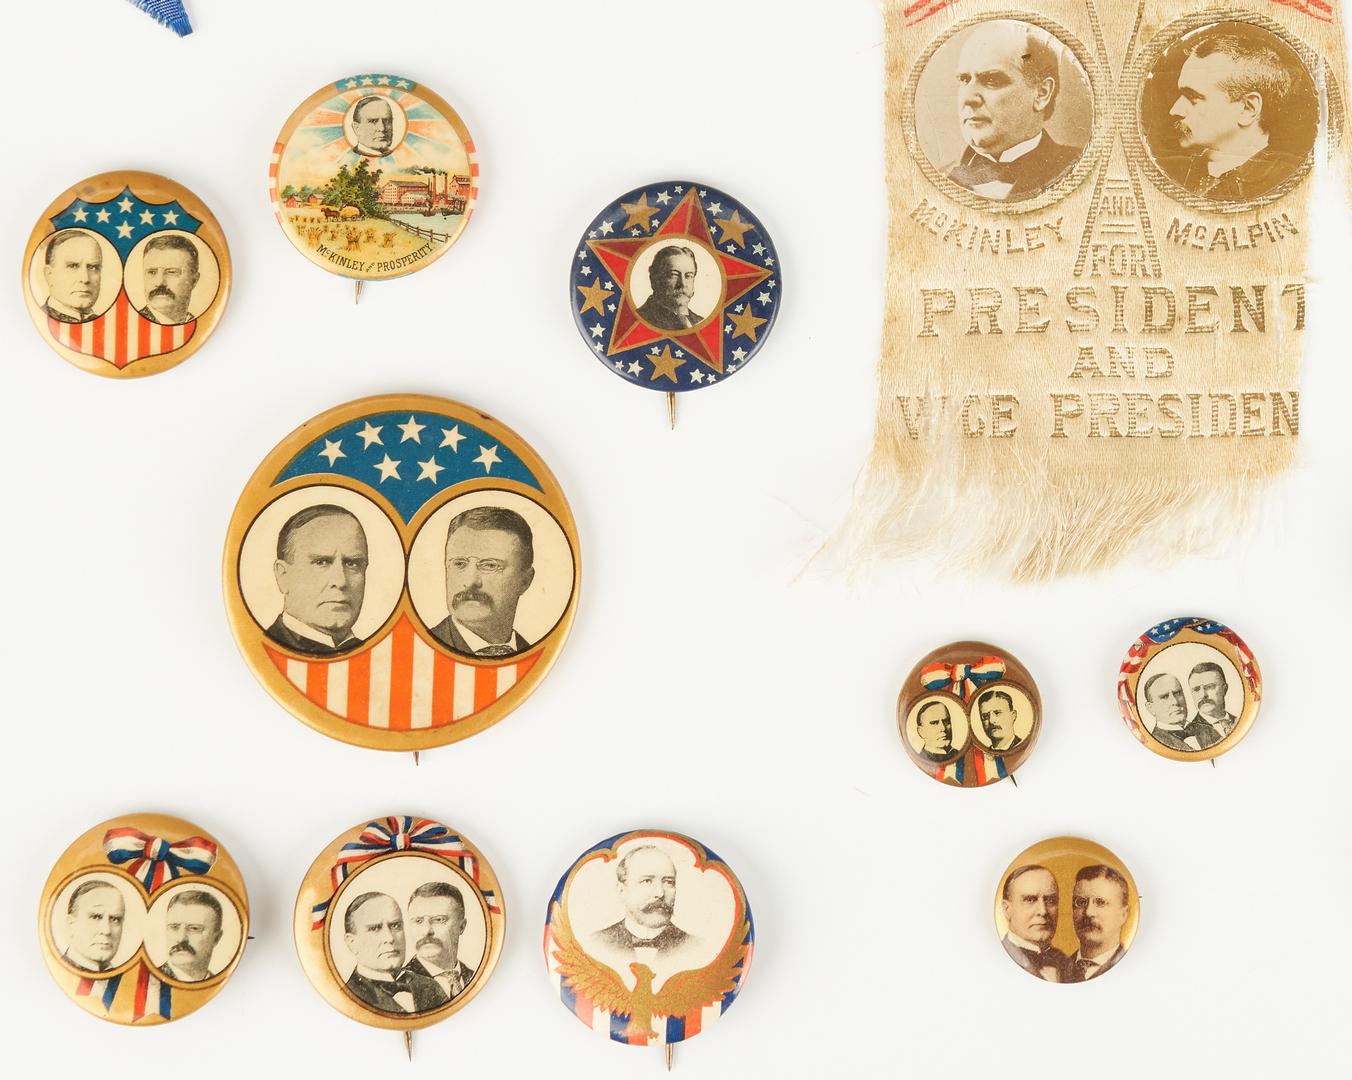 Lot 1011: 23 Presidential Campaign Ephemera Items, incl. McKinley, T. Roosevelt, Taft